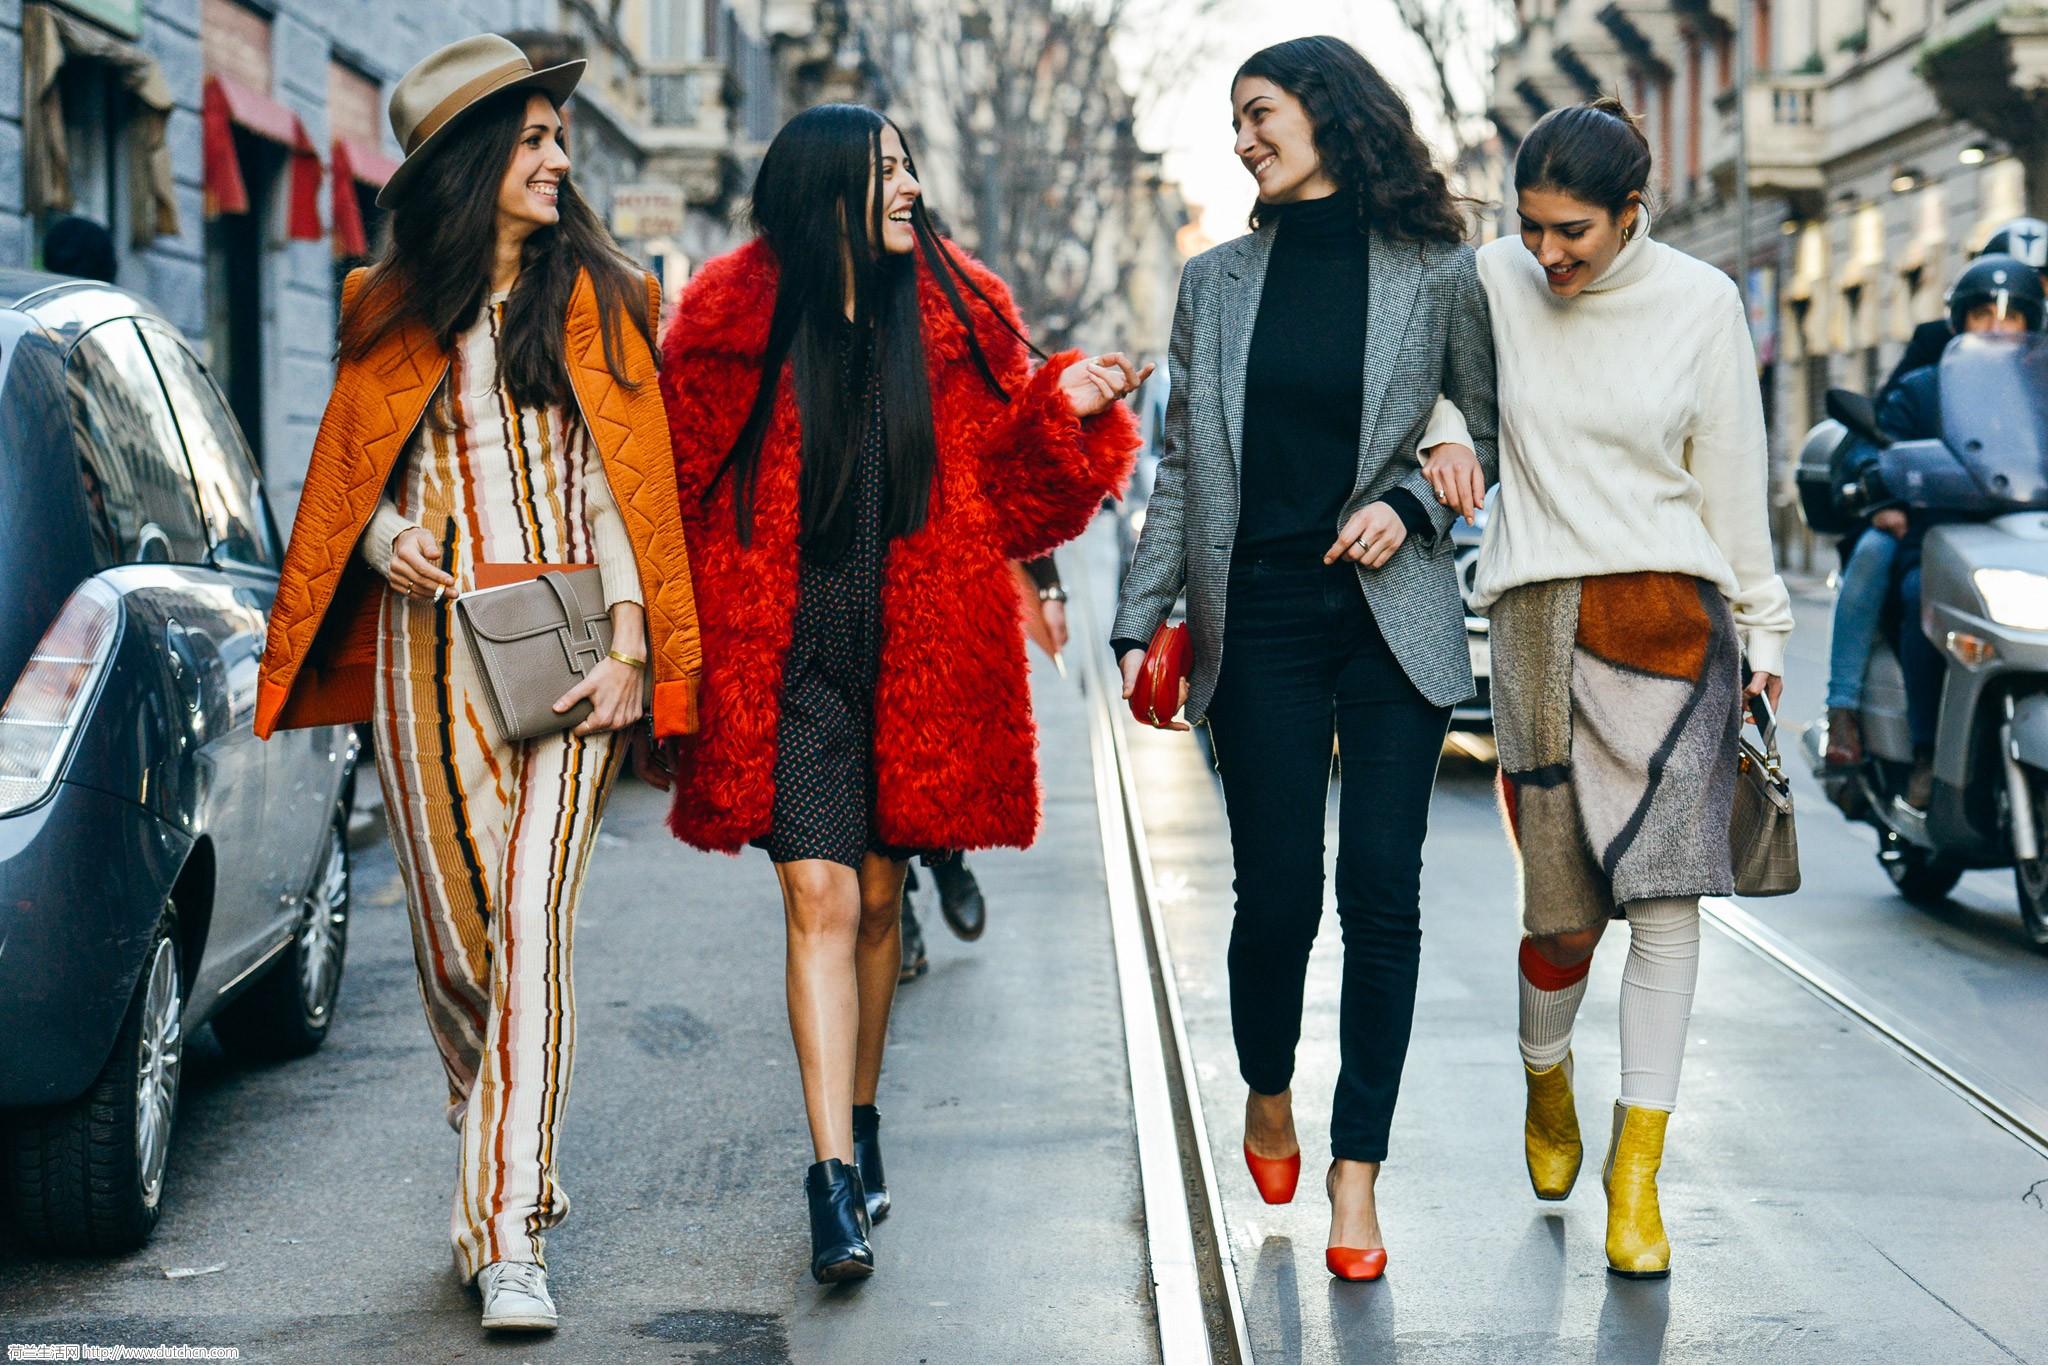 爆料 | Givenchy,Balenciaga,FENDI最低50%off!正价产品凭码22%off